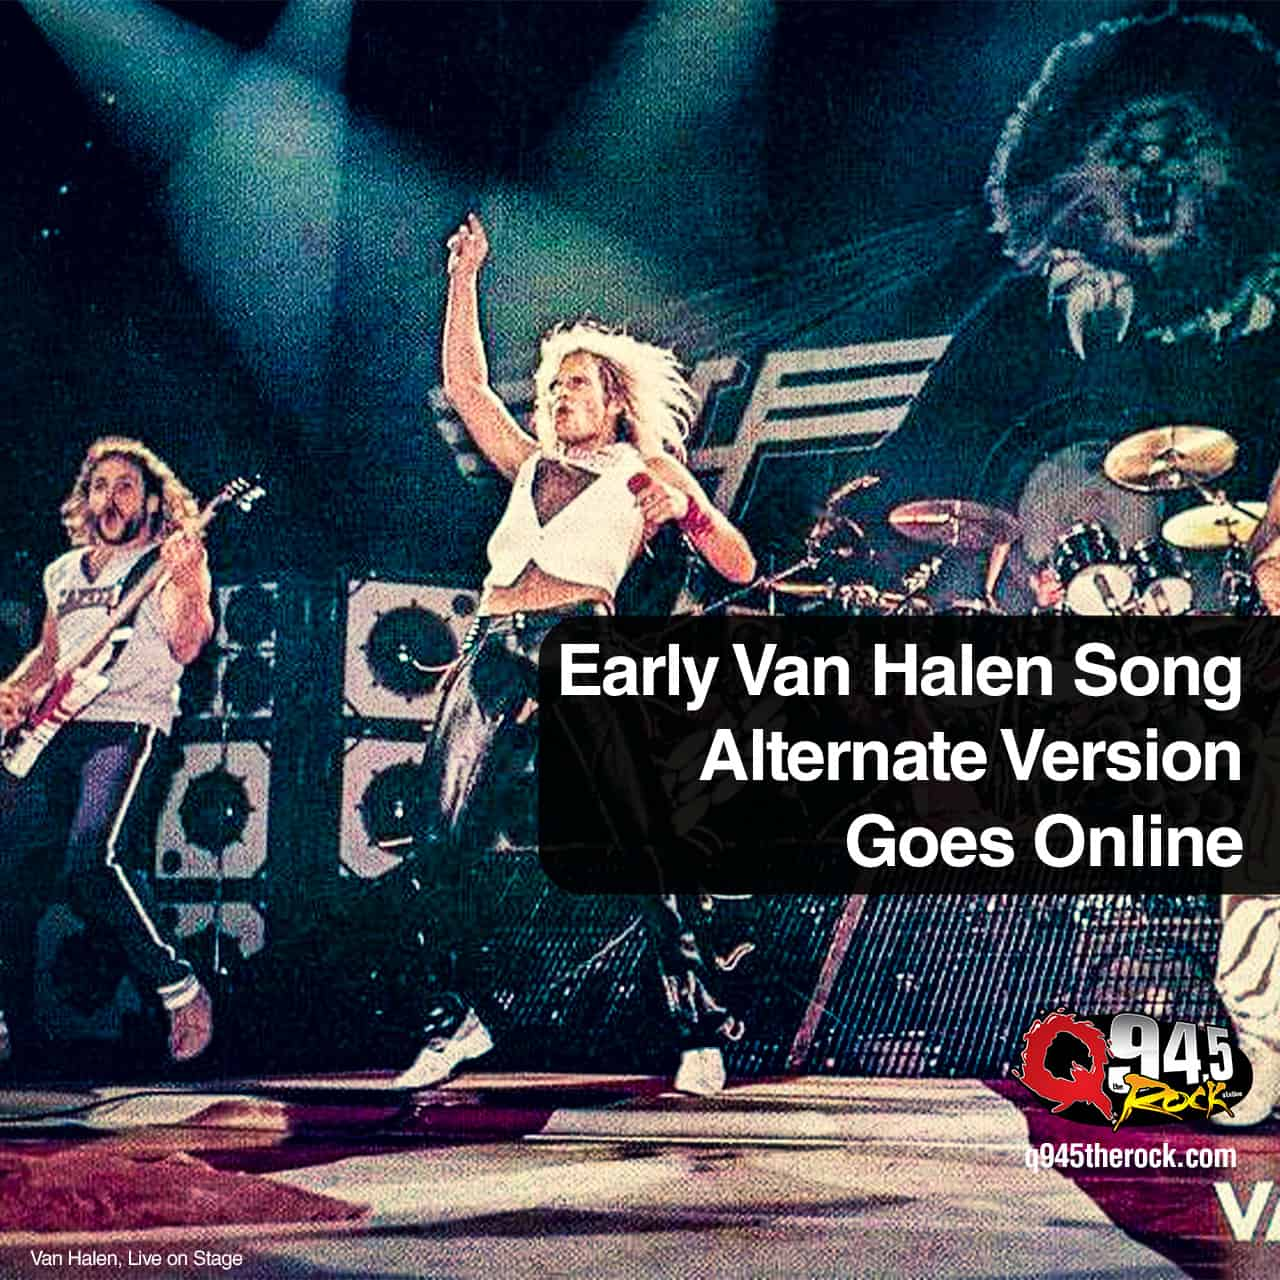 Early Van Halen Song Alternate Version Goes Online